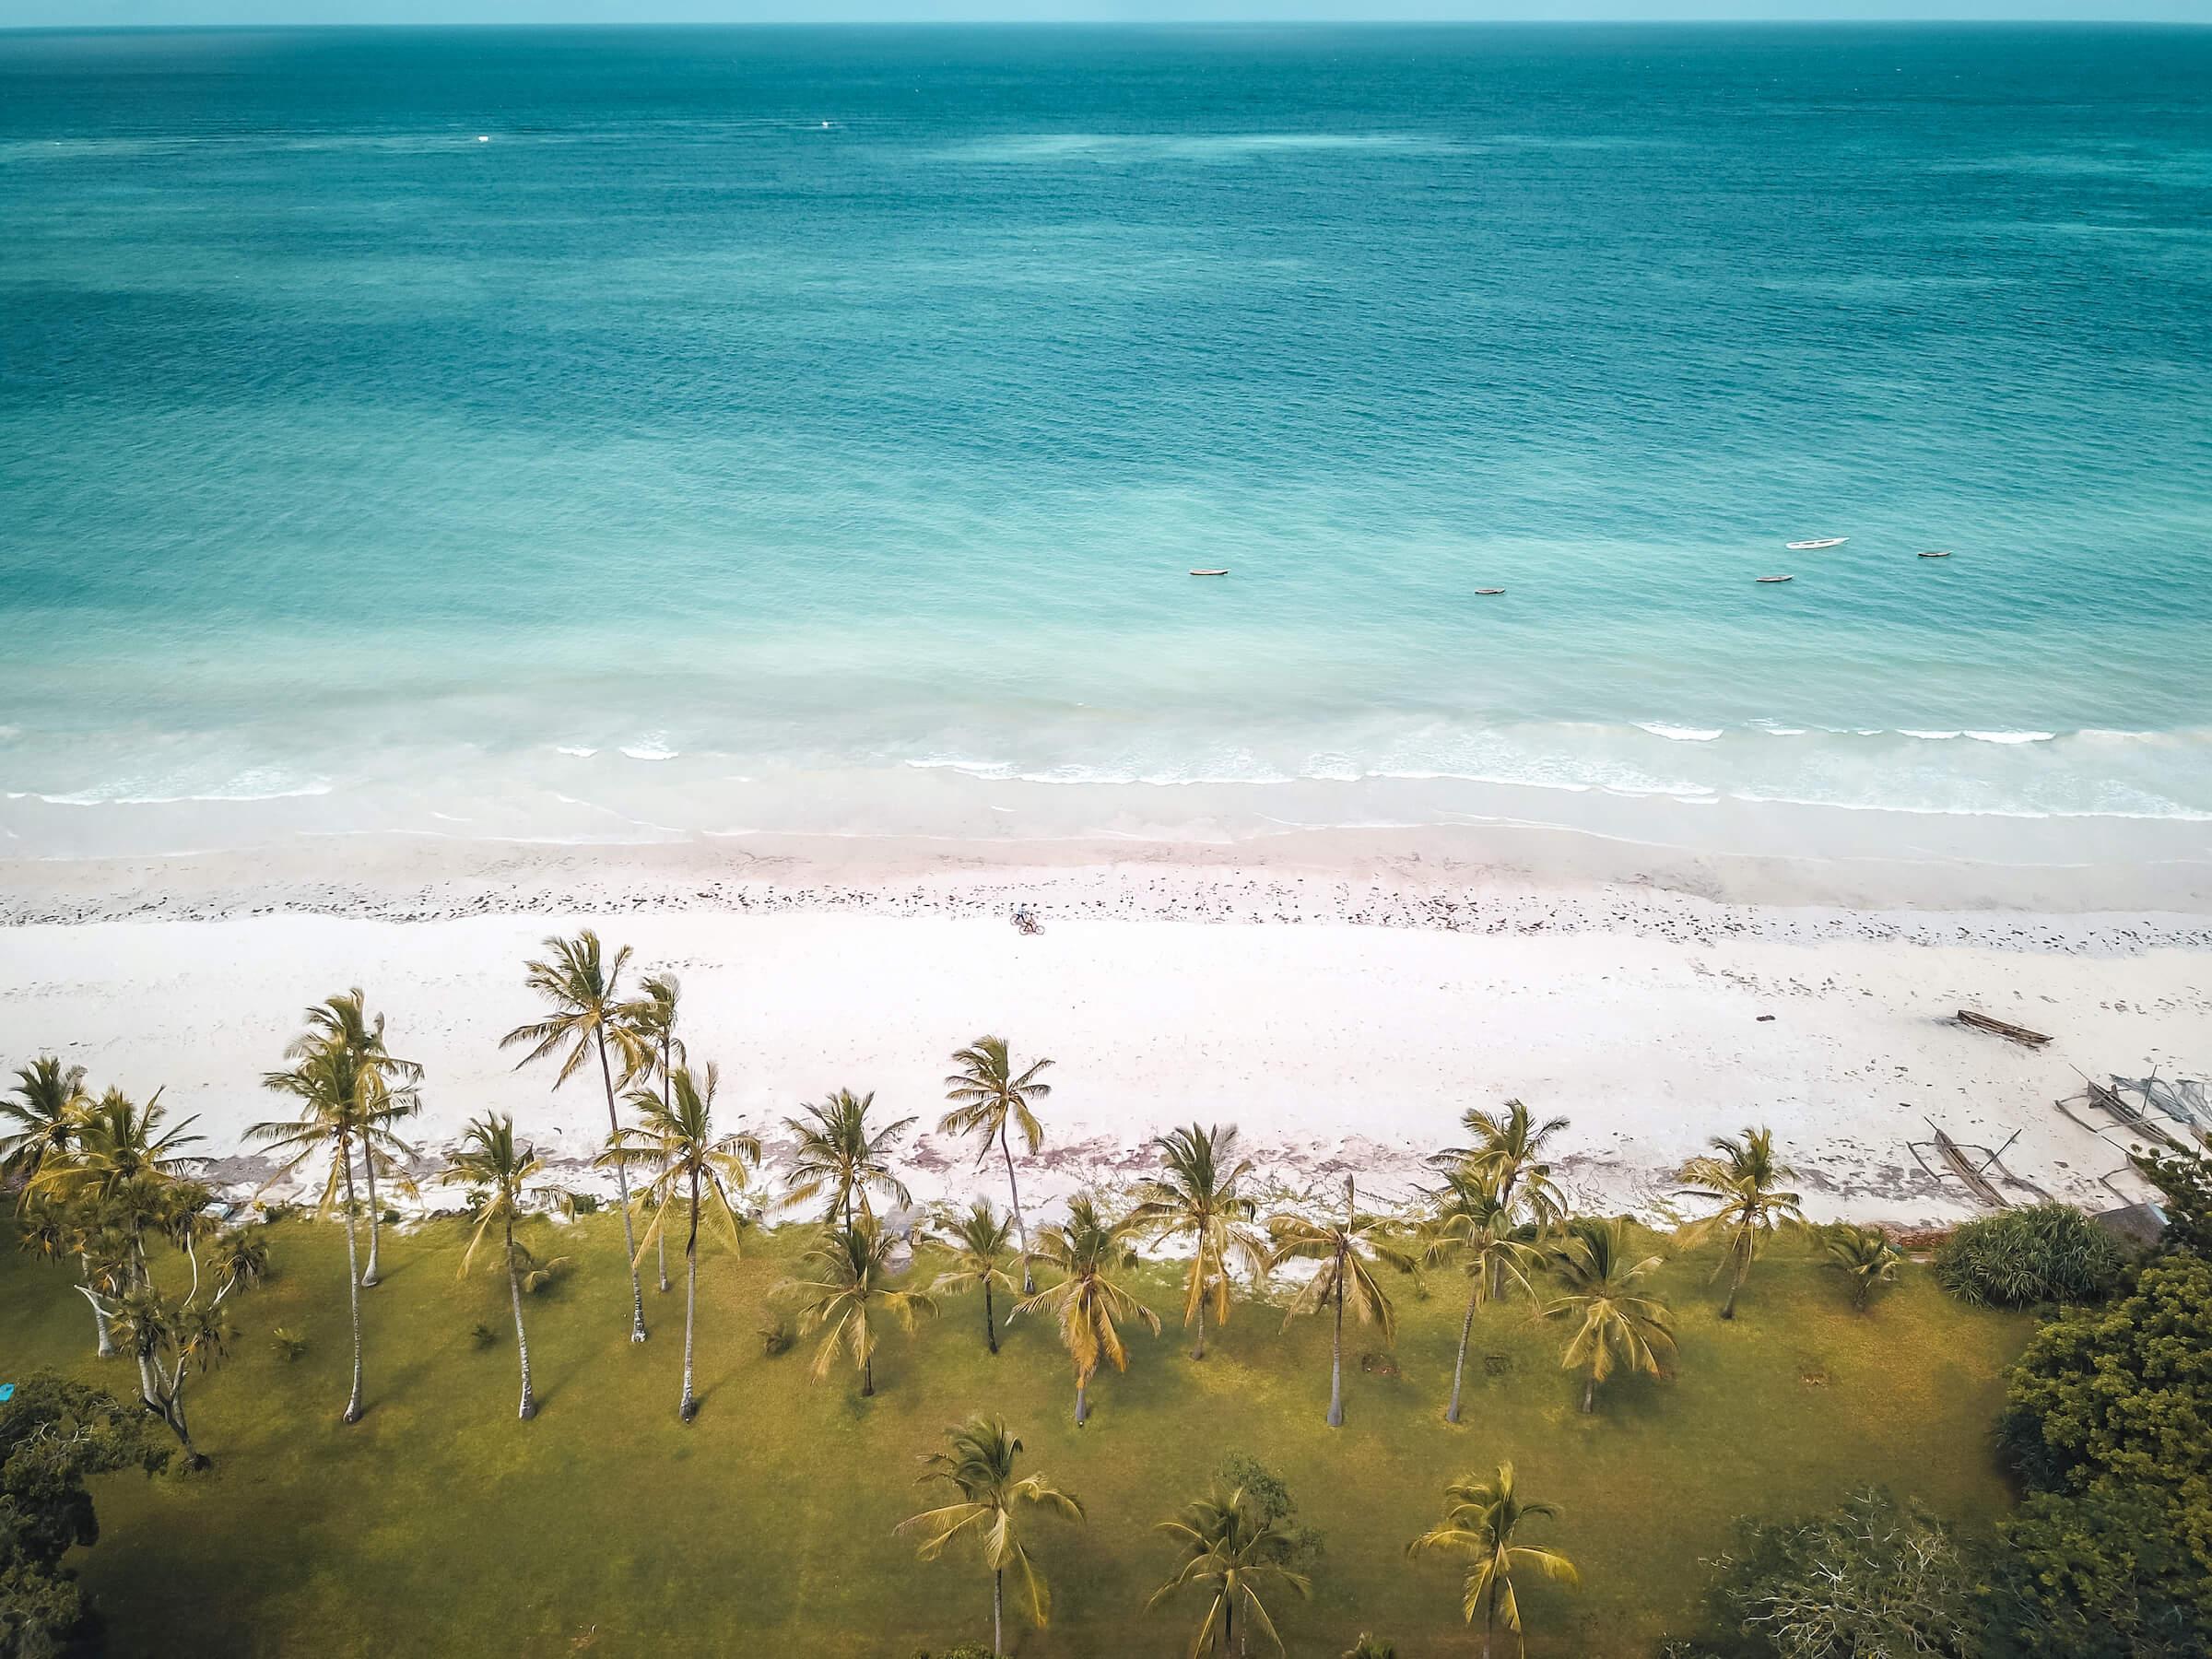 plage kenya côte palmier